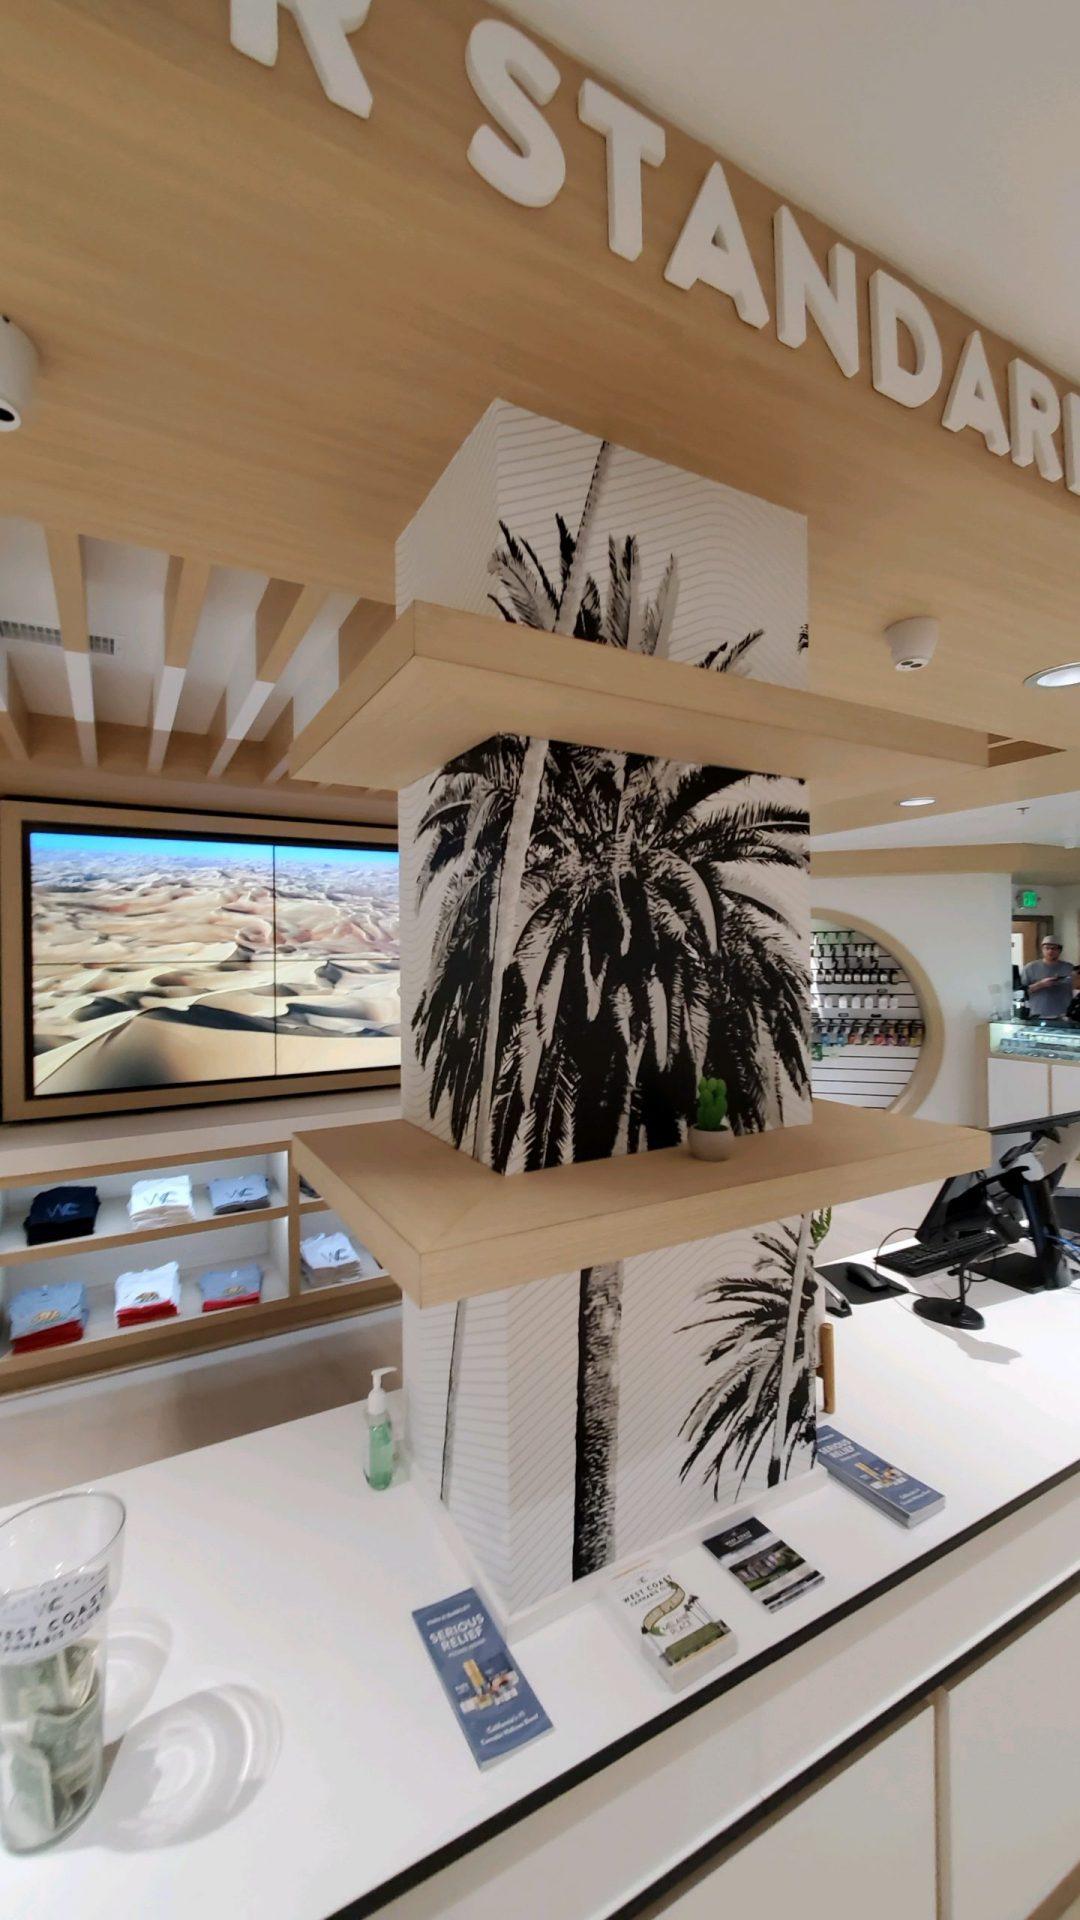 Standar Display : standar, display, Display, Fabrication, Interior, Branding